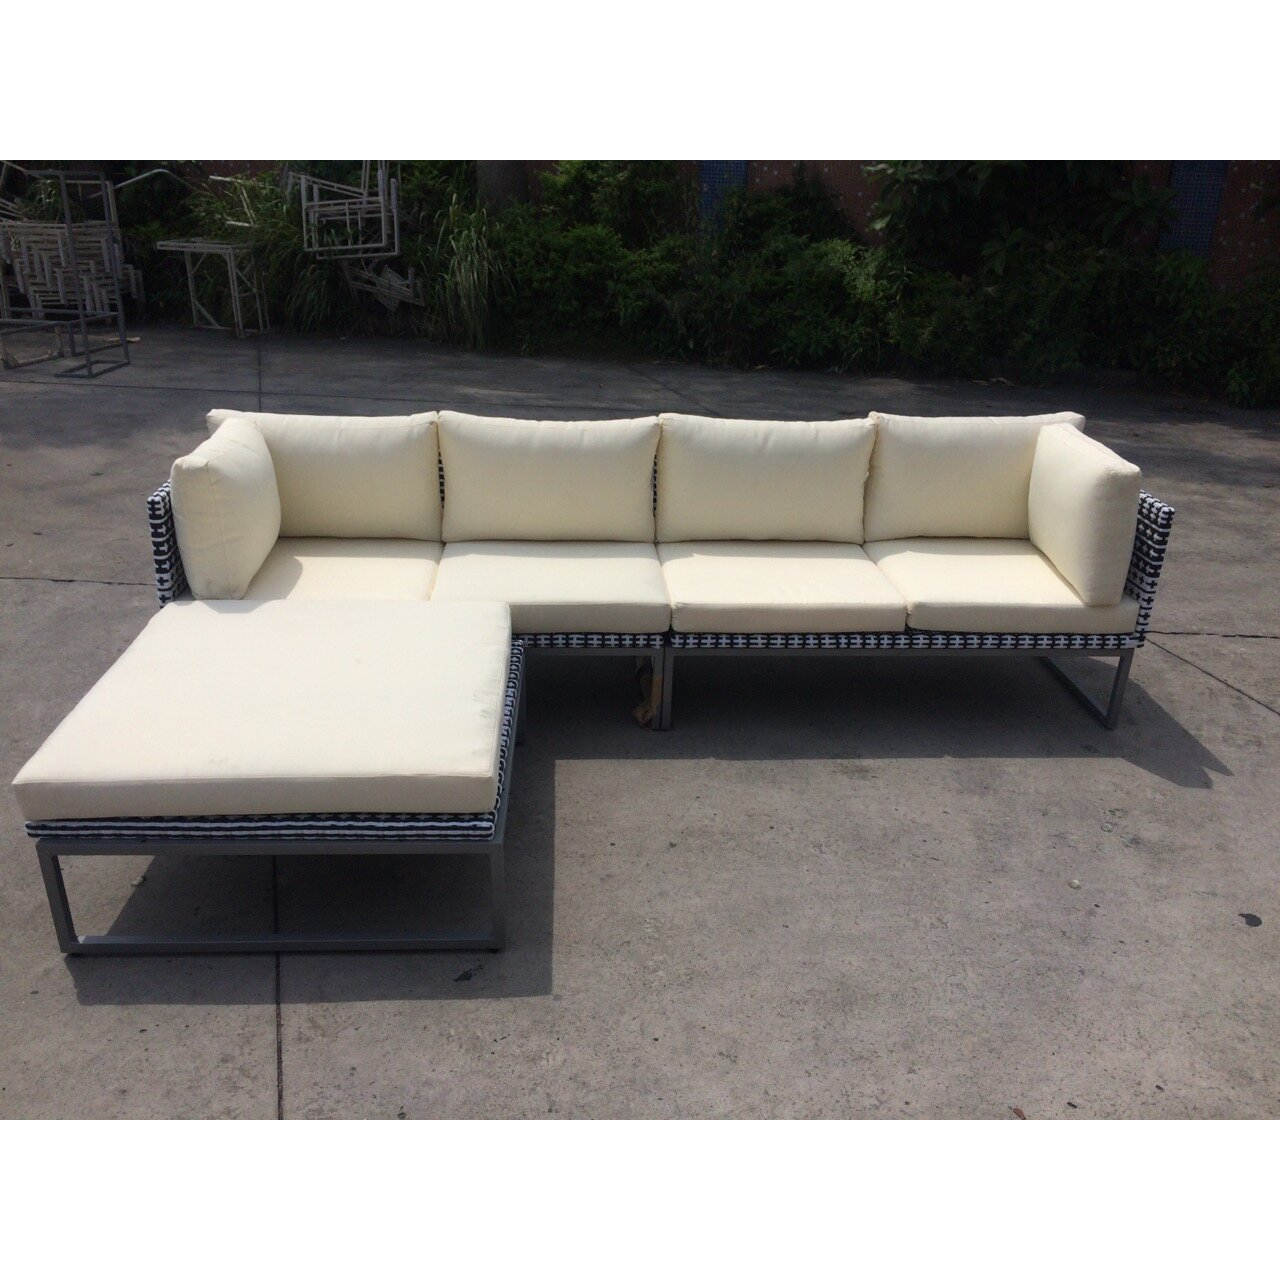 SignatureRattan KQ Maui Deep Seating Sofa With Cushions